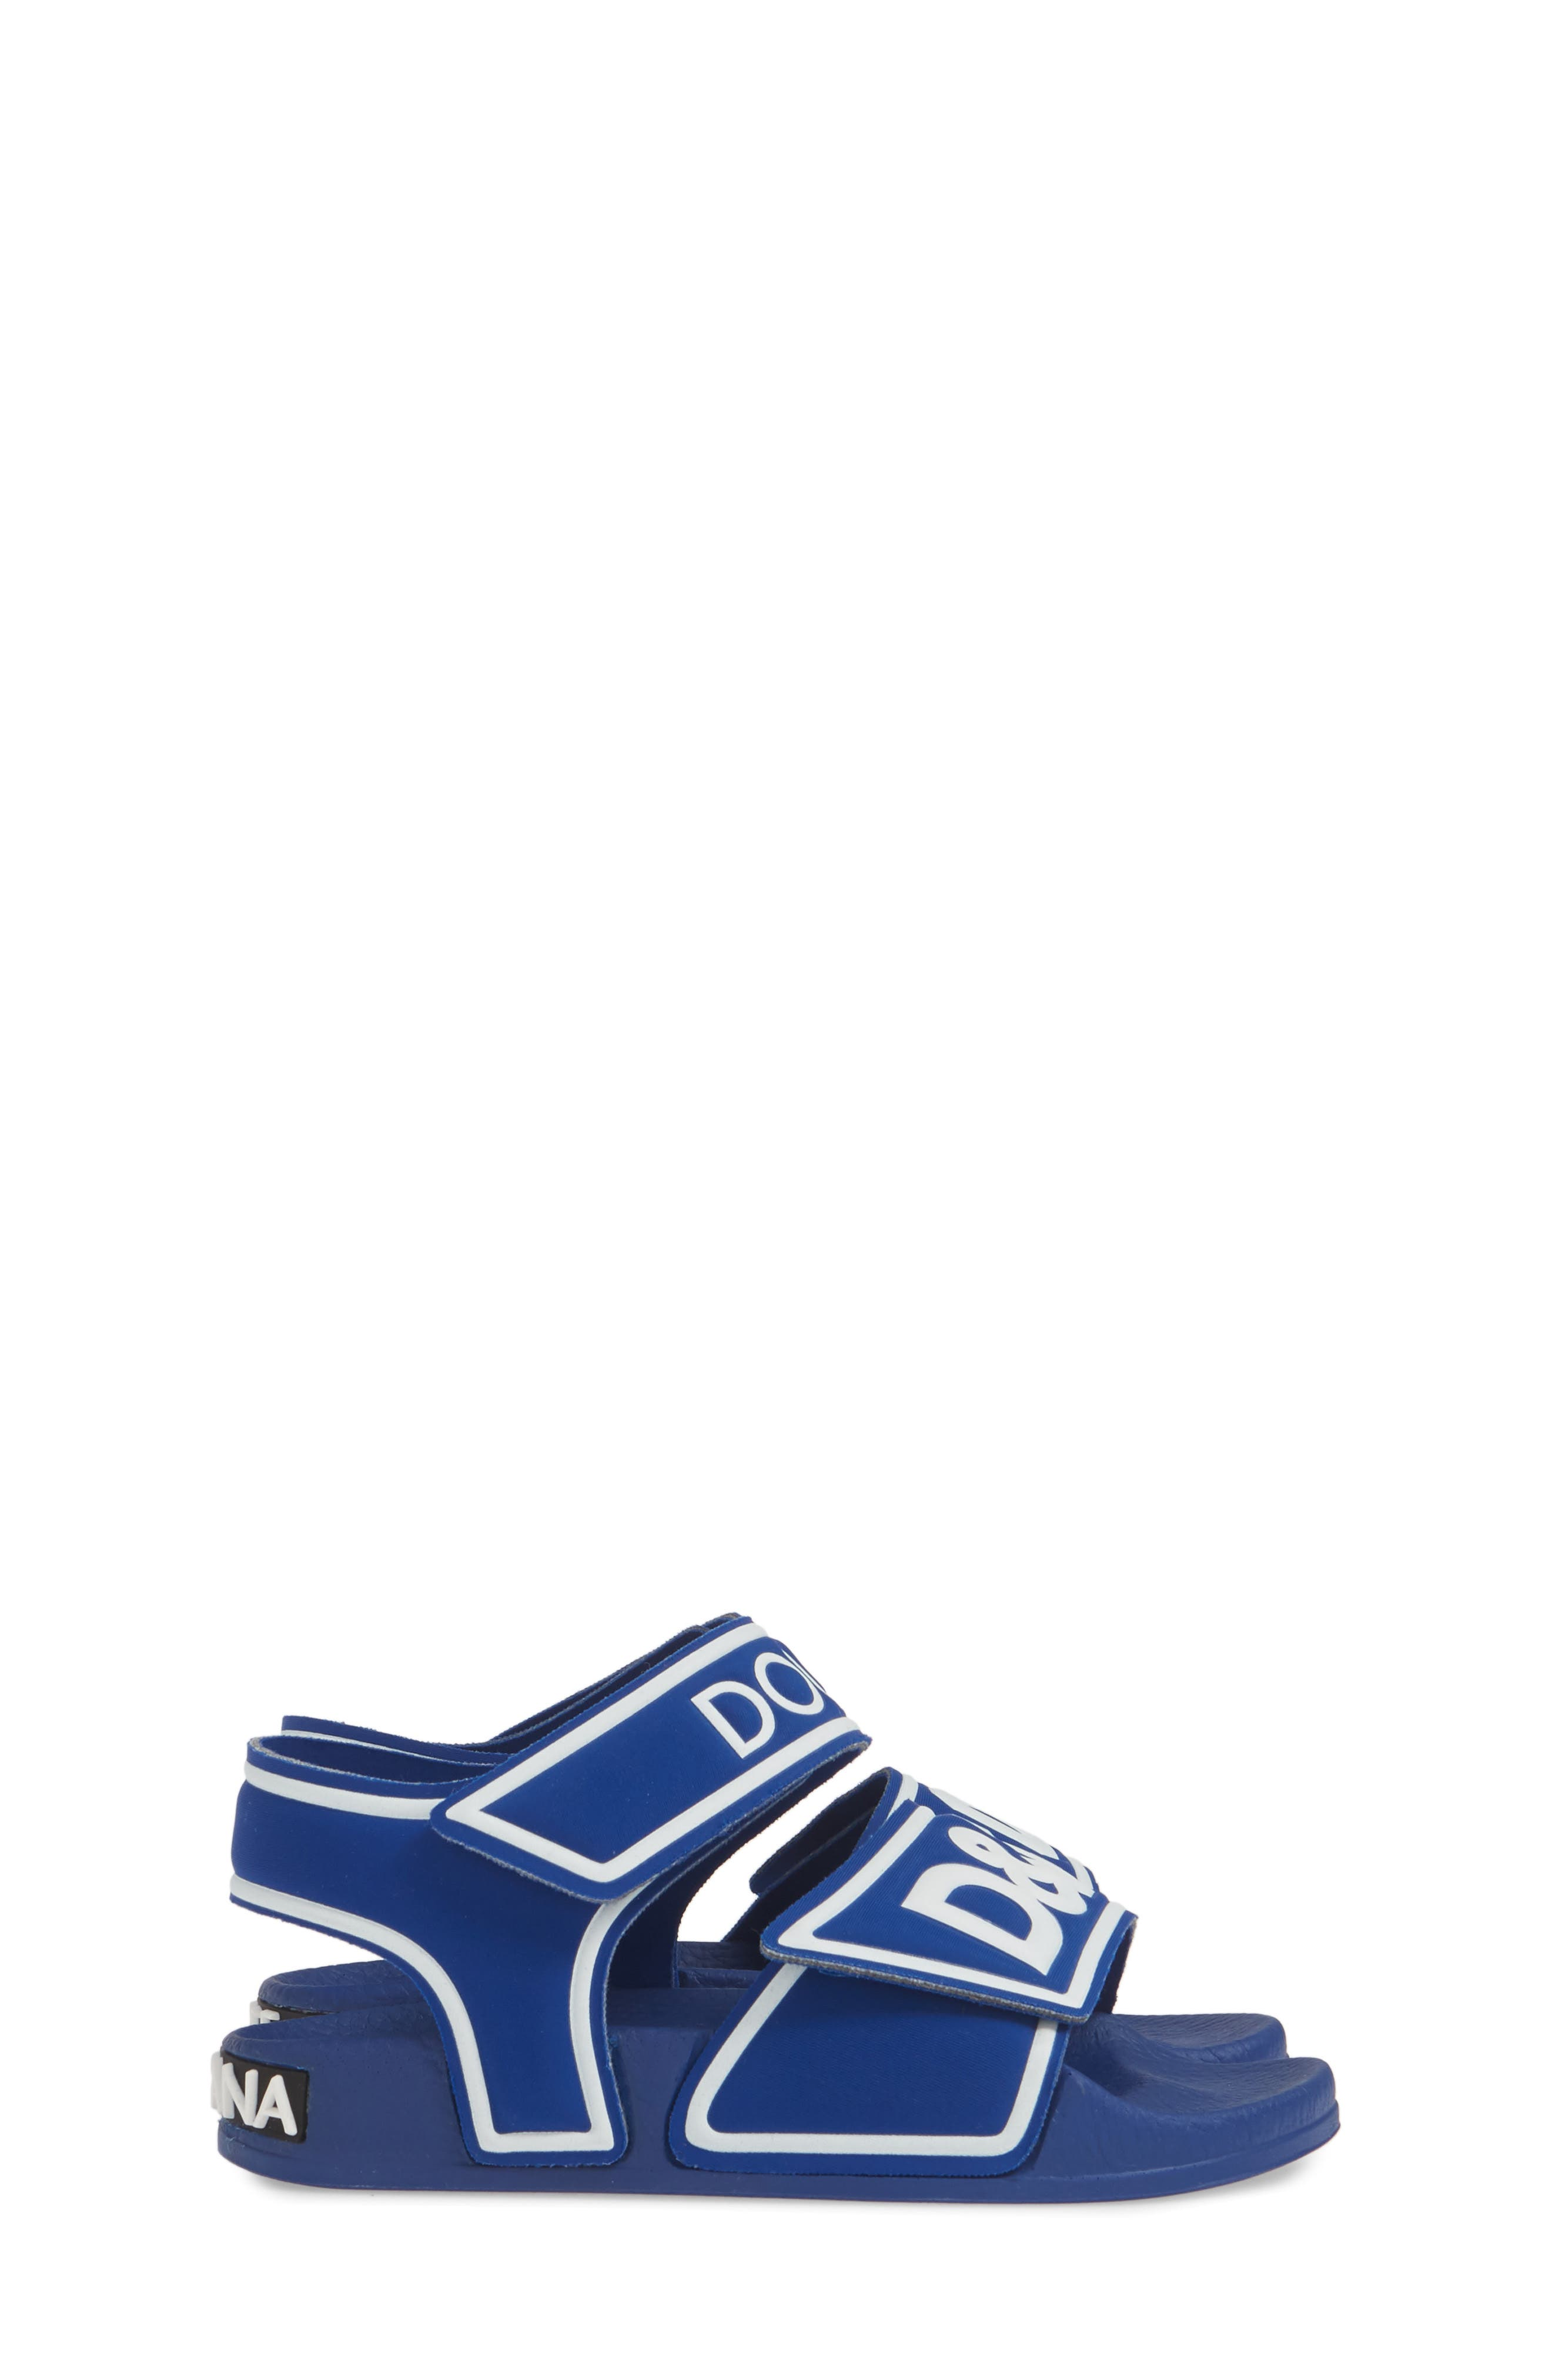 DOLCE&GABBANA, Jelly Fisherman Sandal, Alternate thumbnail 4, color, BLUE/ WHITE